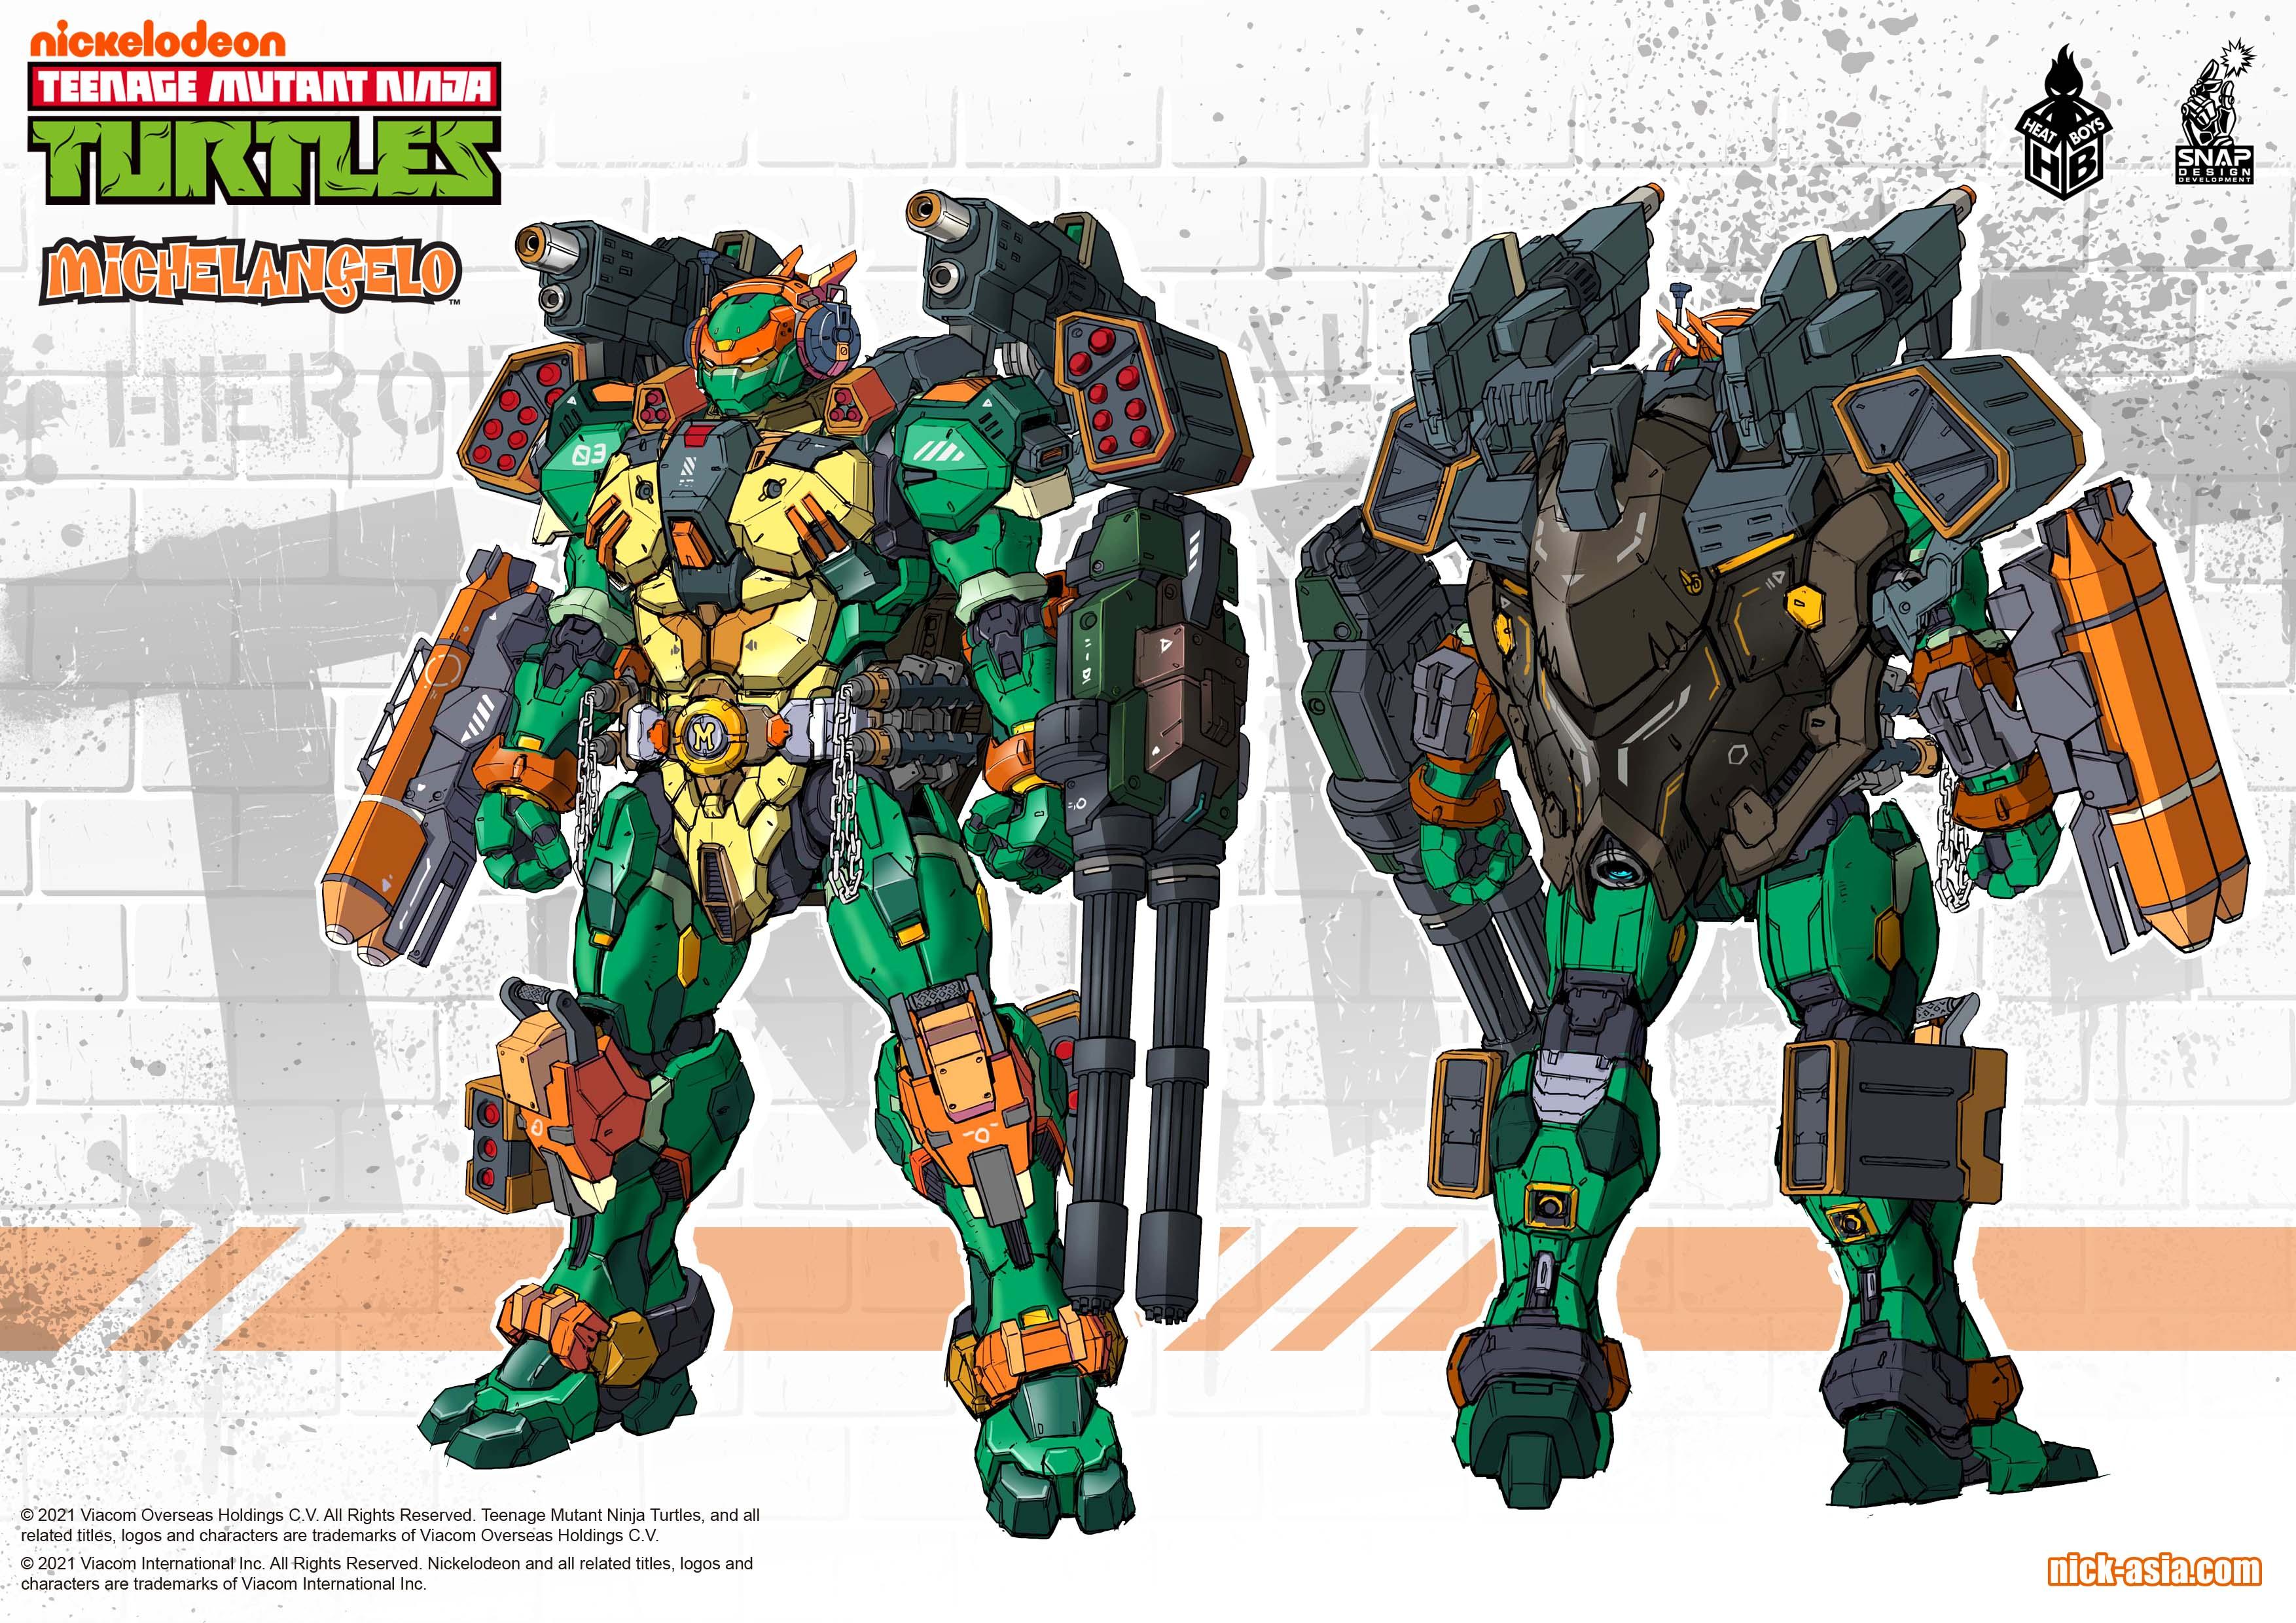 Link a Teenage Mutant Ninja Turtles prototipo per le Turtles robotiche di Heat Boys x Snap Desing – (1)